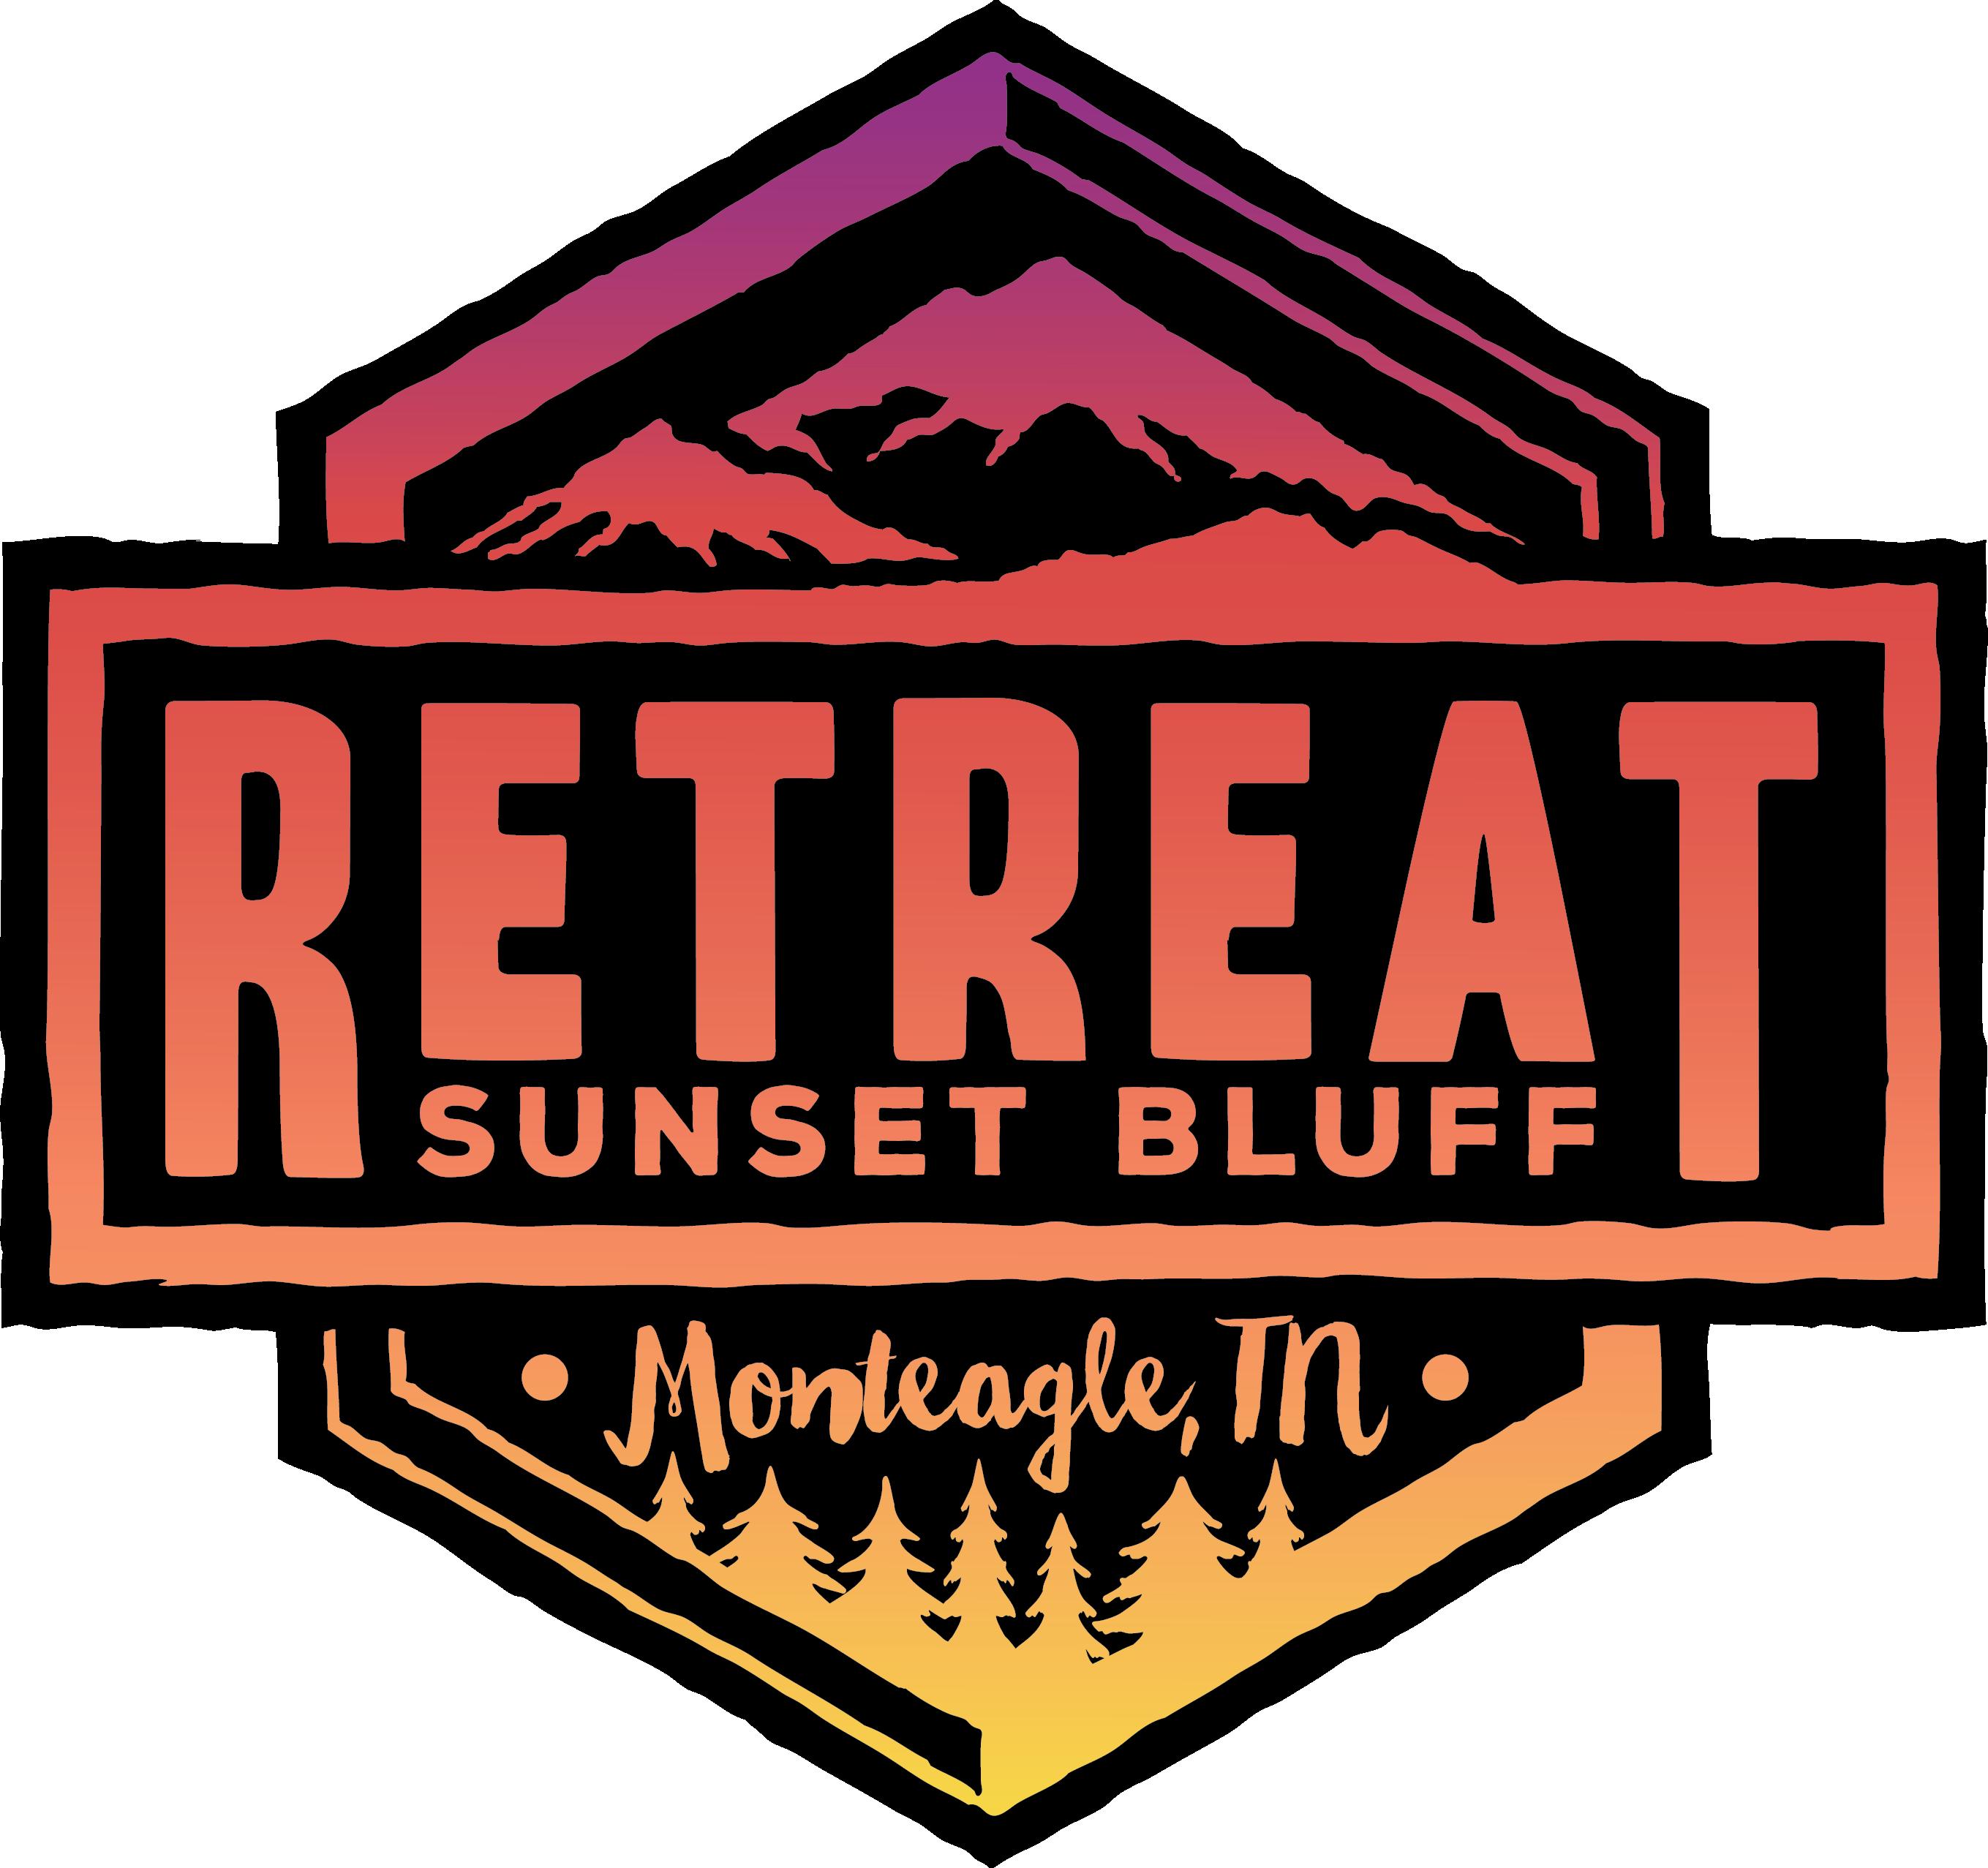 Sunset Bluff